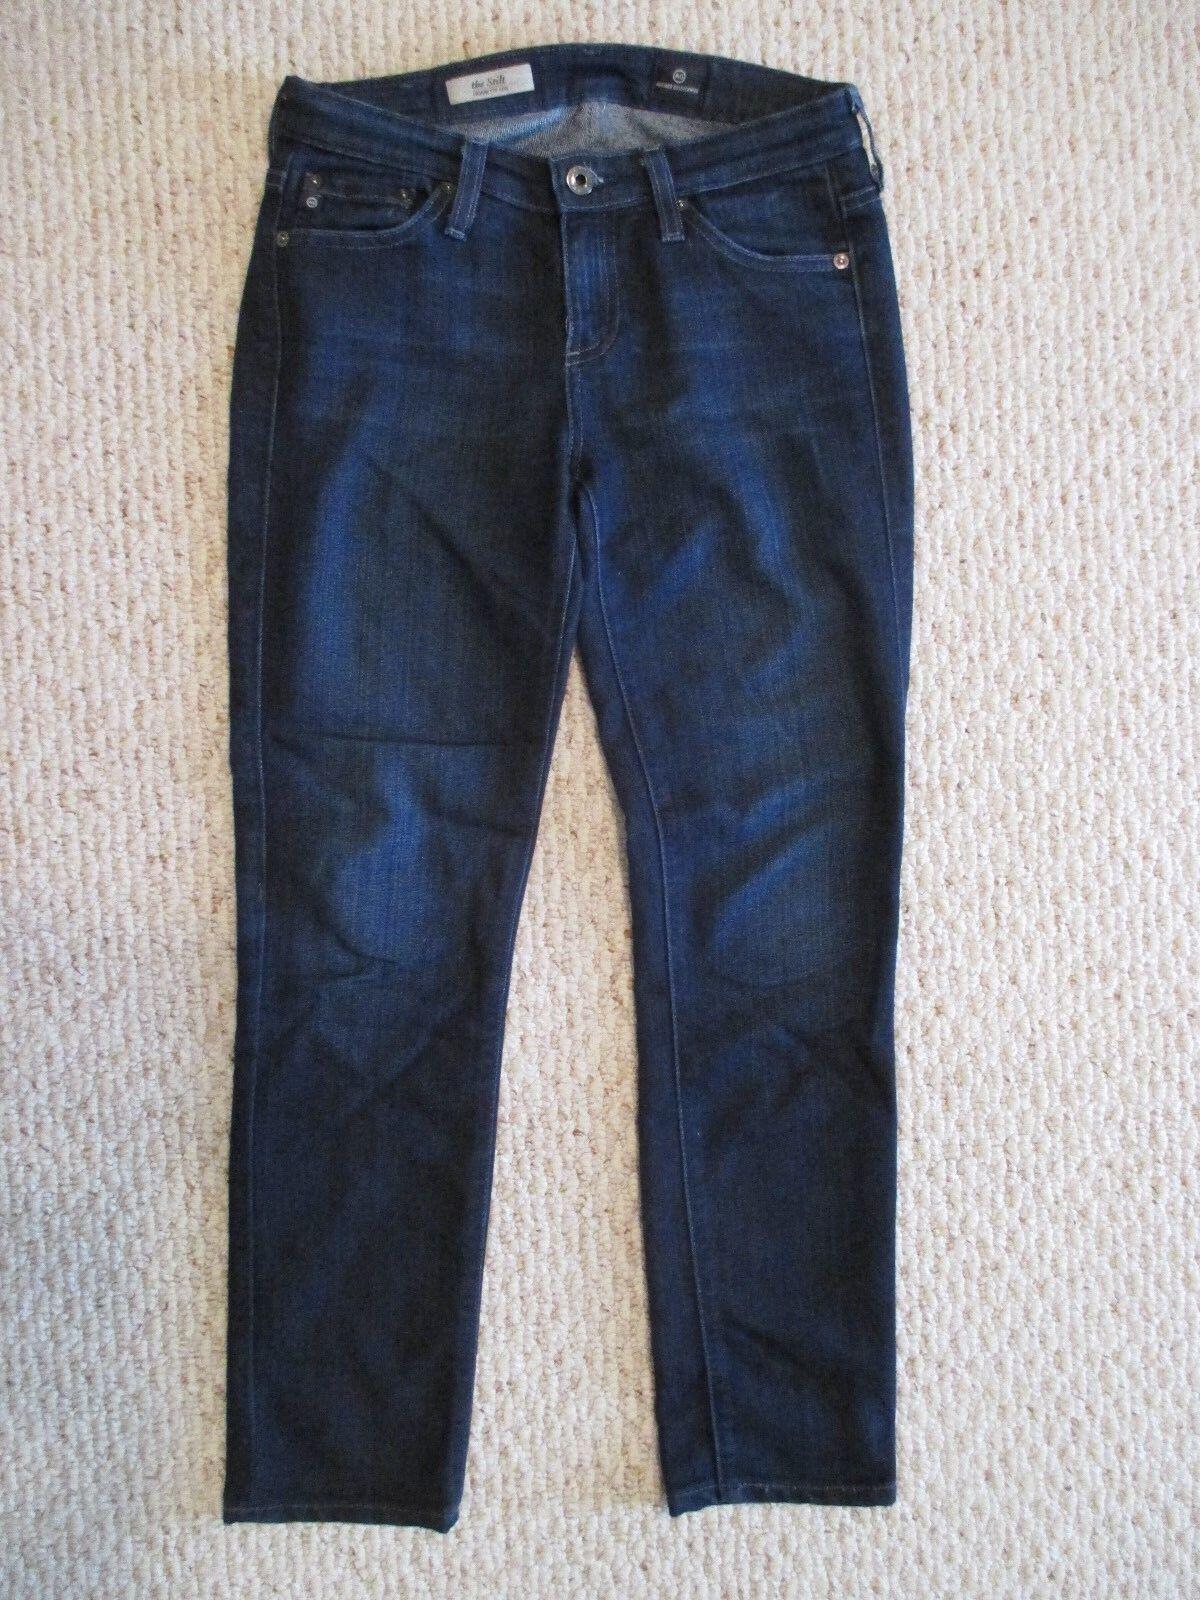 Adriano goldschmied The Stilt Cigarette Jeans Size 25 X 26